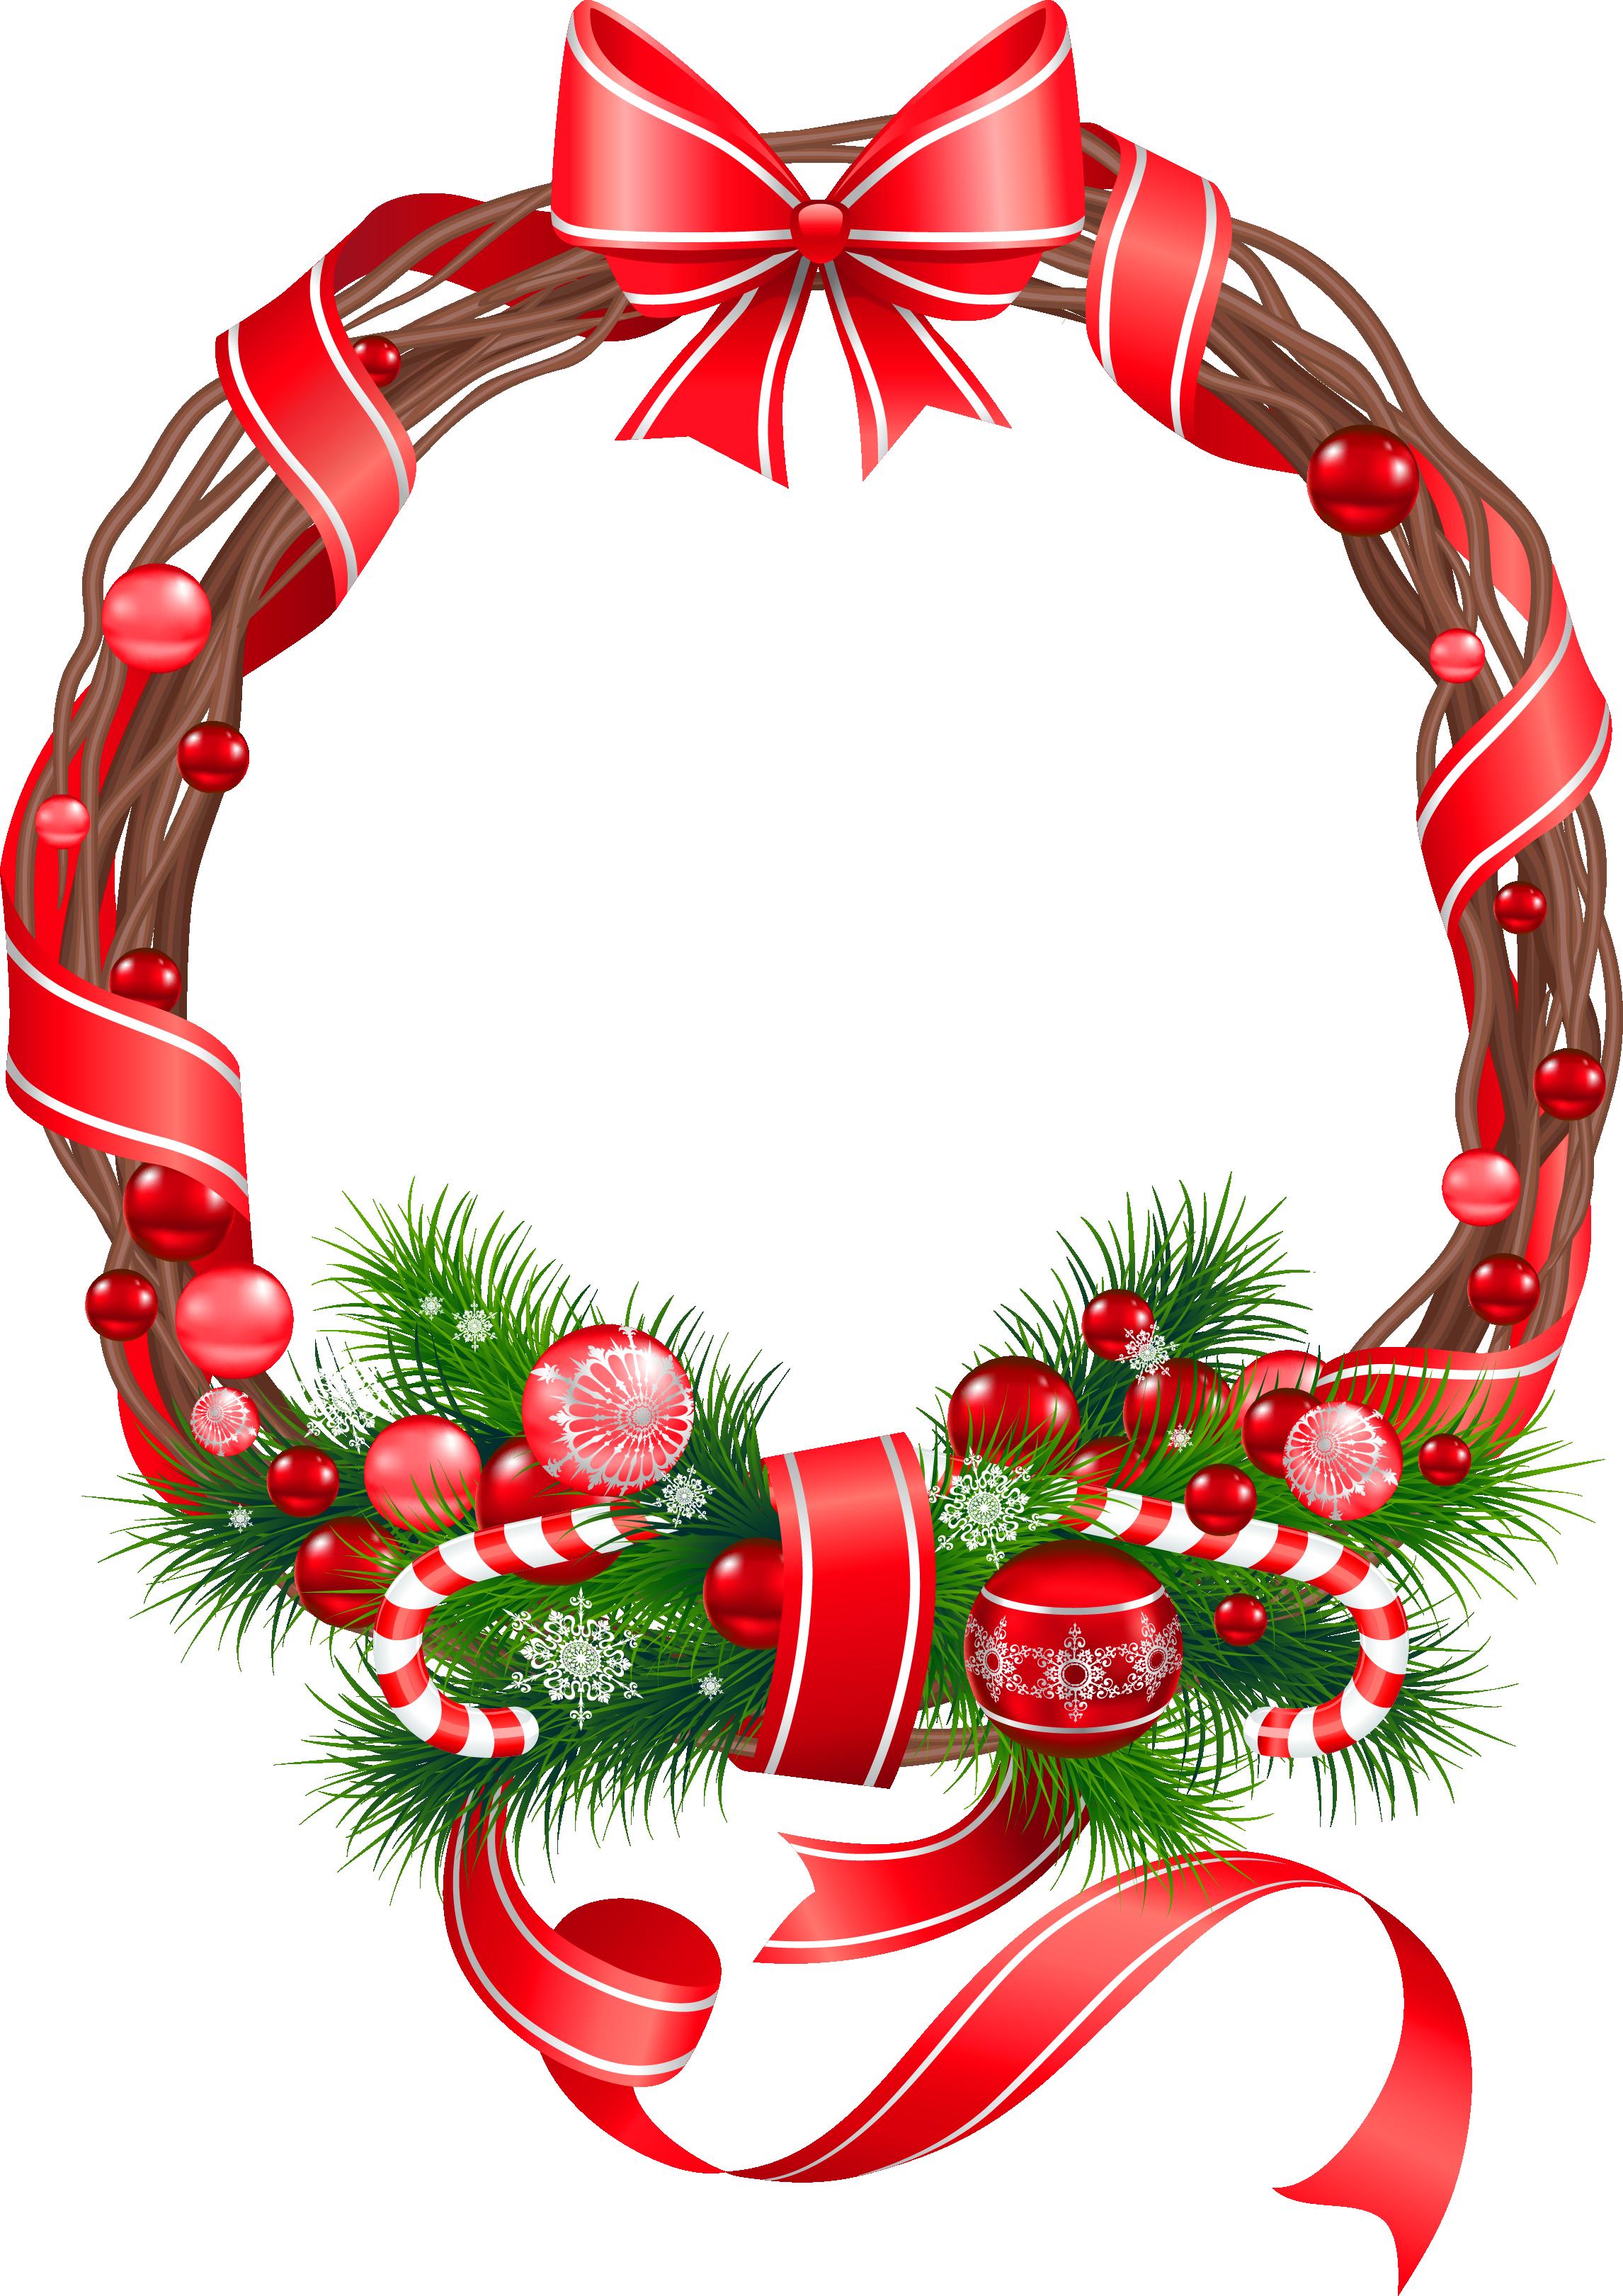 National Park Christmas Ornaments